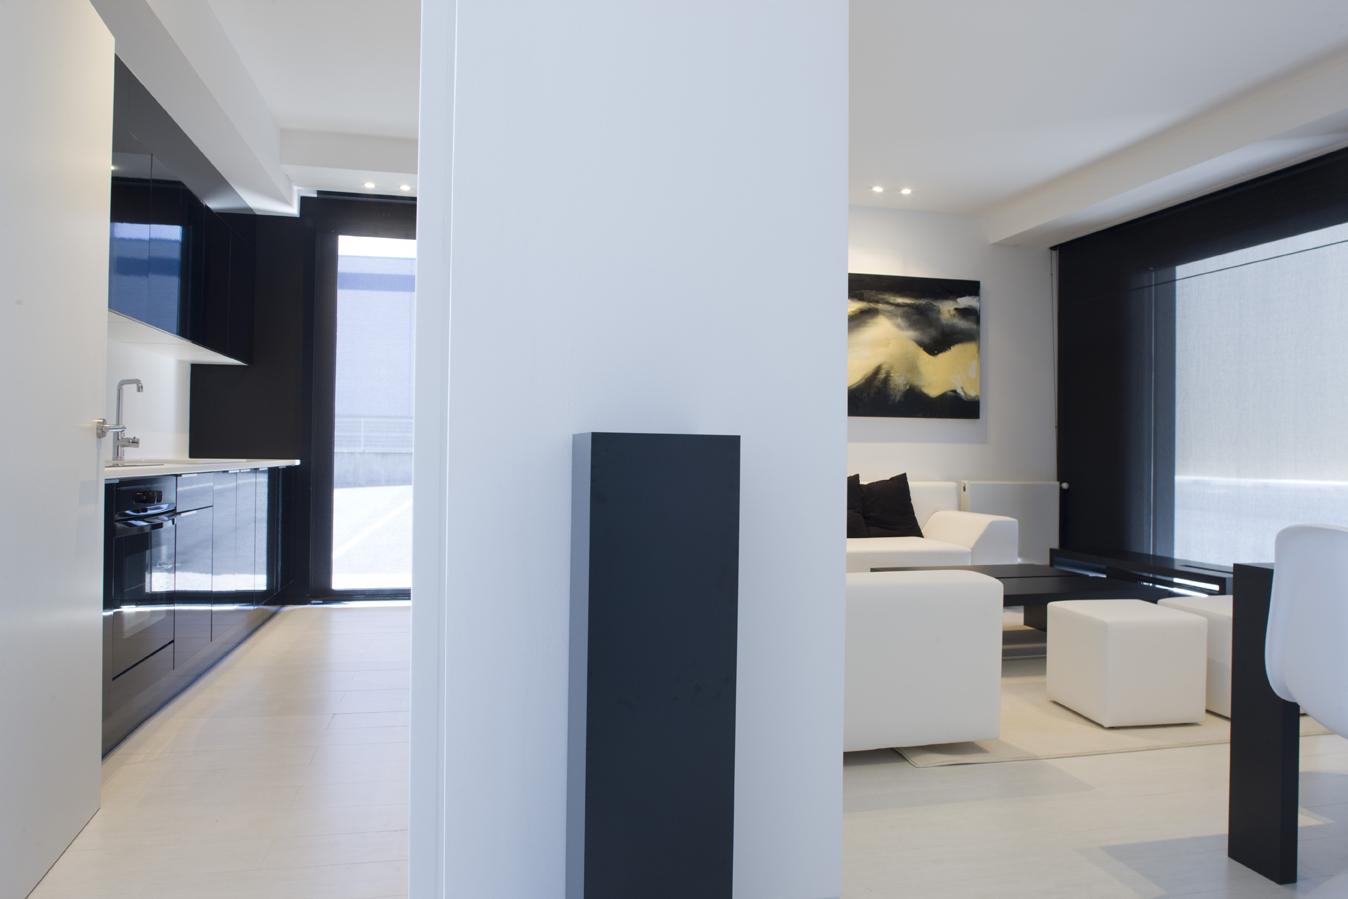 Stainless steel vivienda modular i - Casa modular acero ...